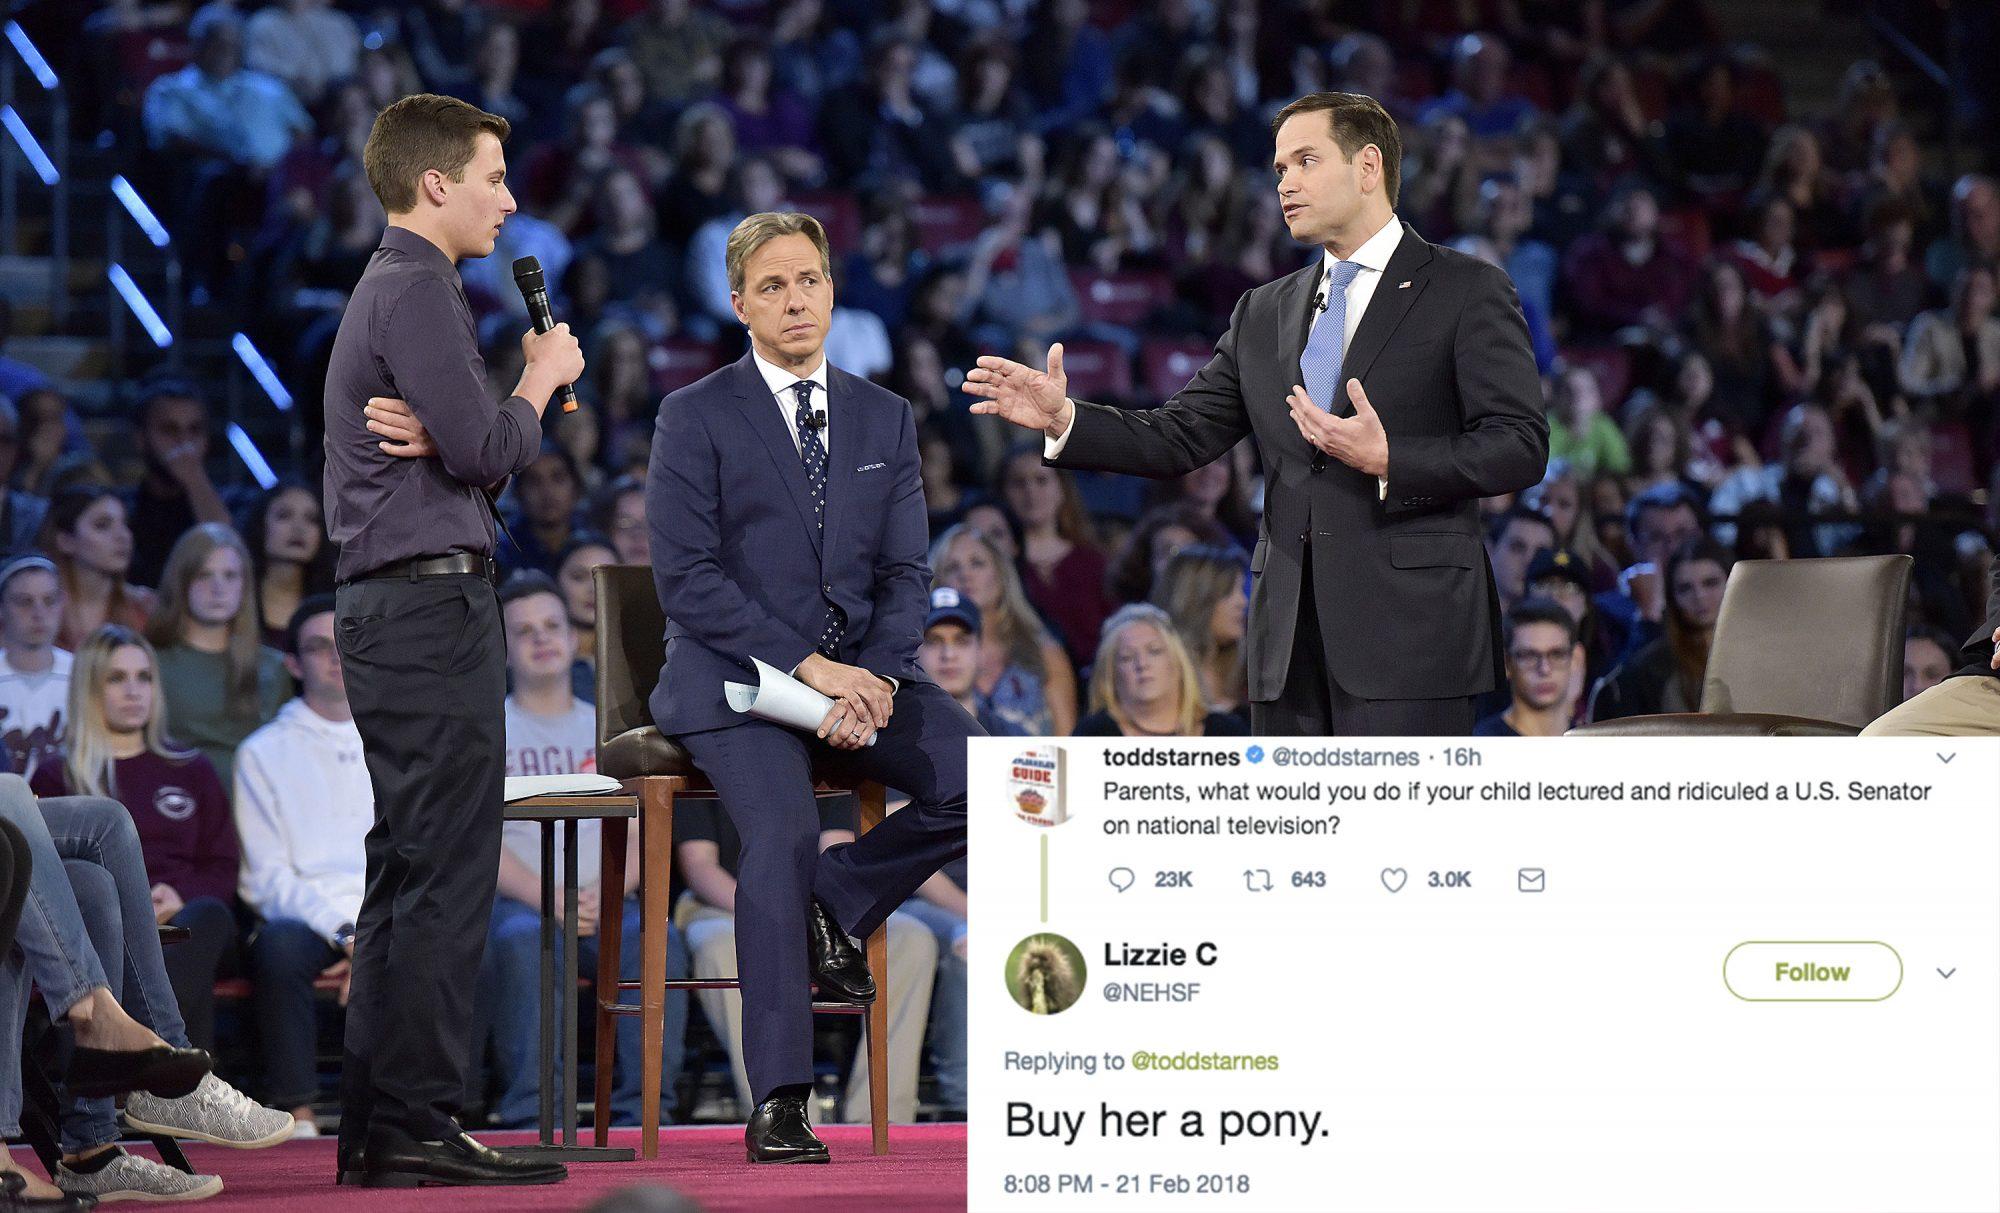 Marco Rubio ridiculed